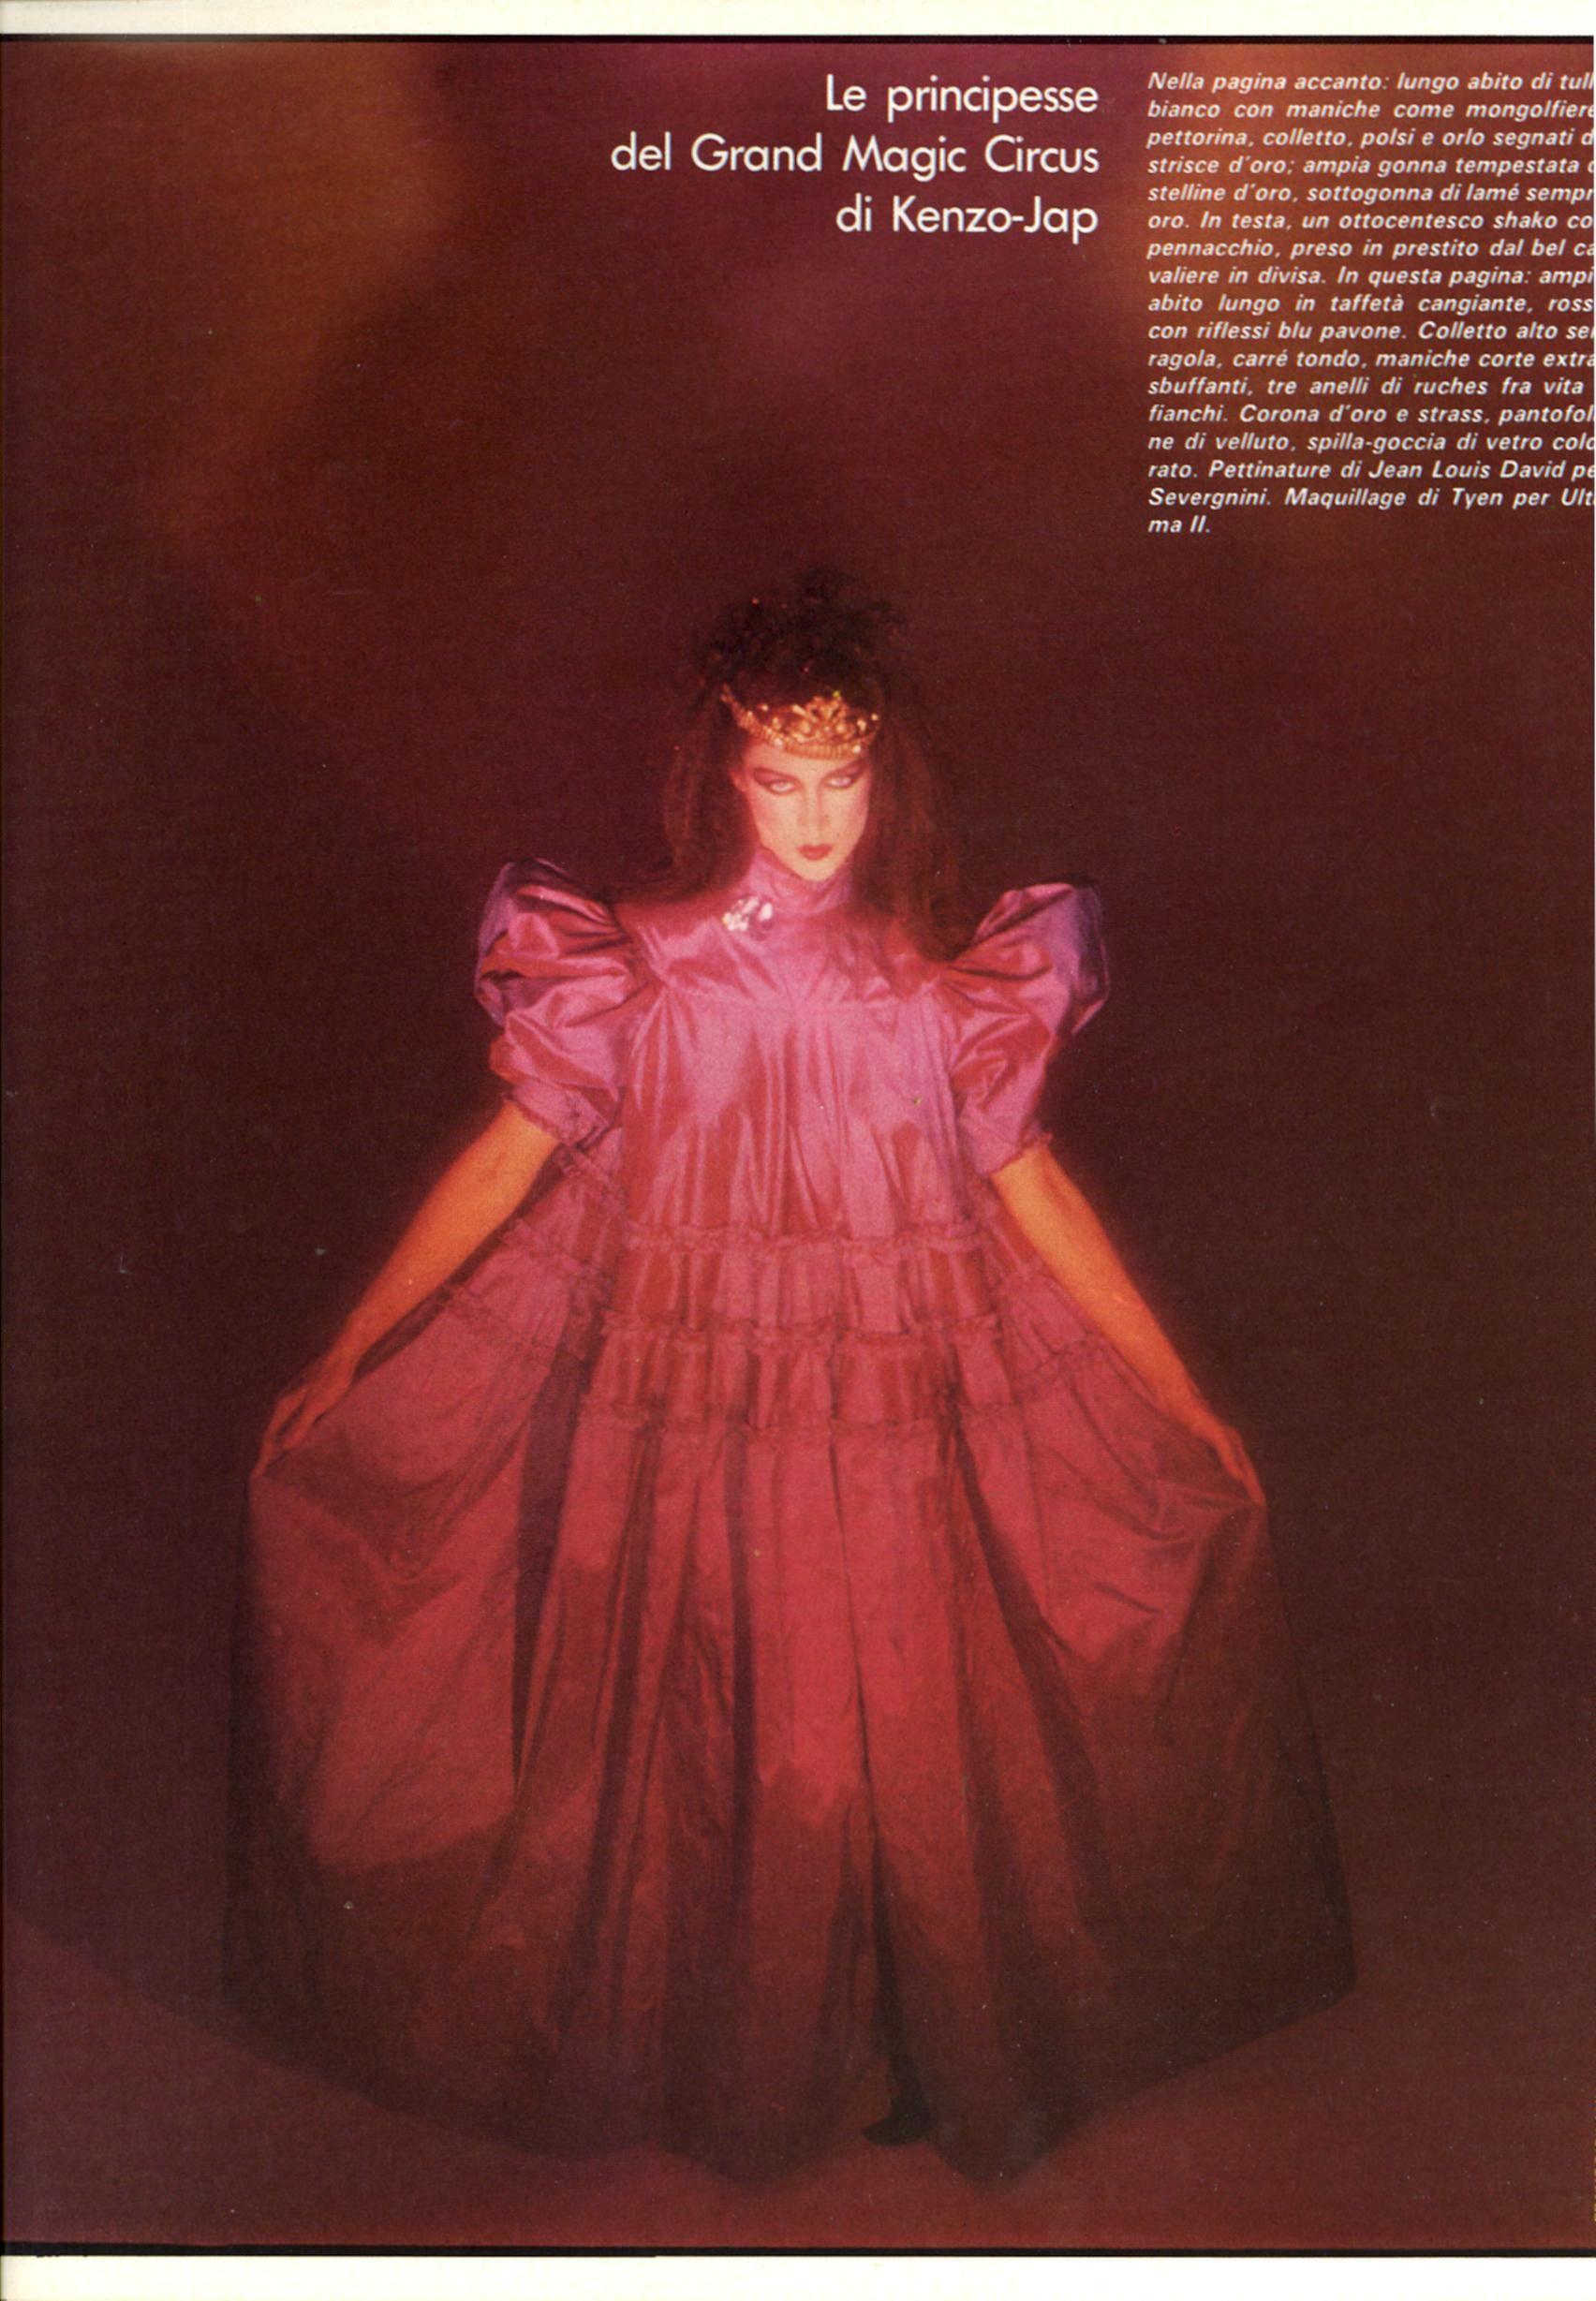 Vogue Italia December 1978 Abiti Iperbole di Cinque Firme Famose Photo François Lamy  Models Marie Helvin, Pat Cleveland, Clotilde